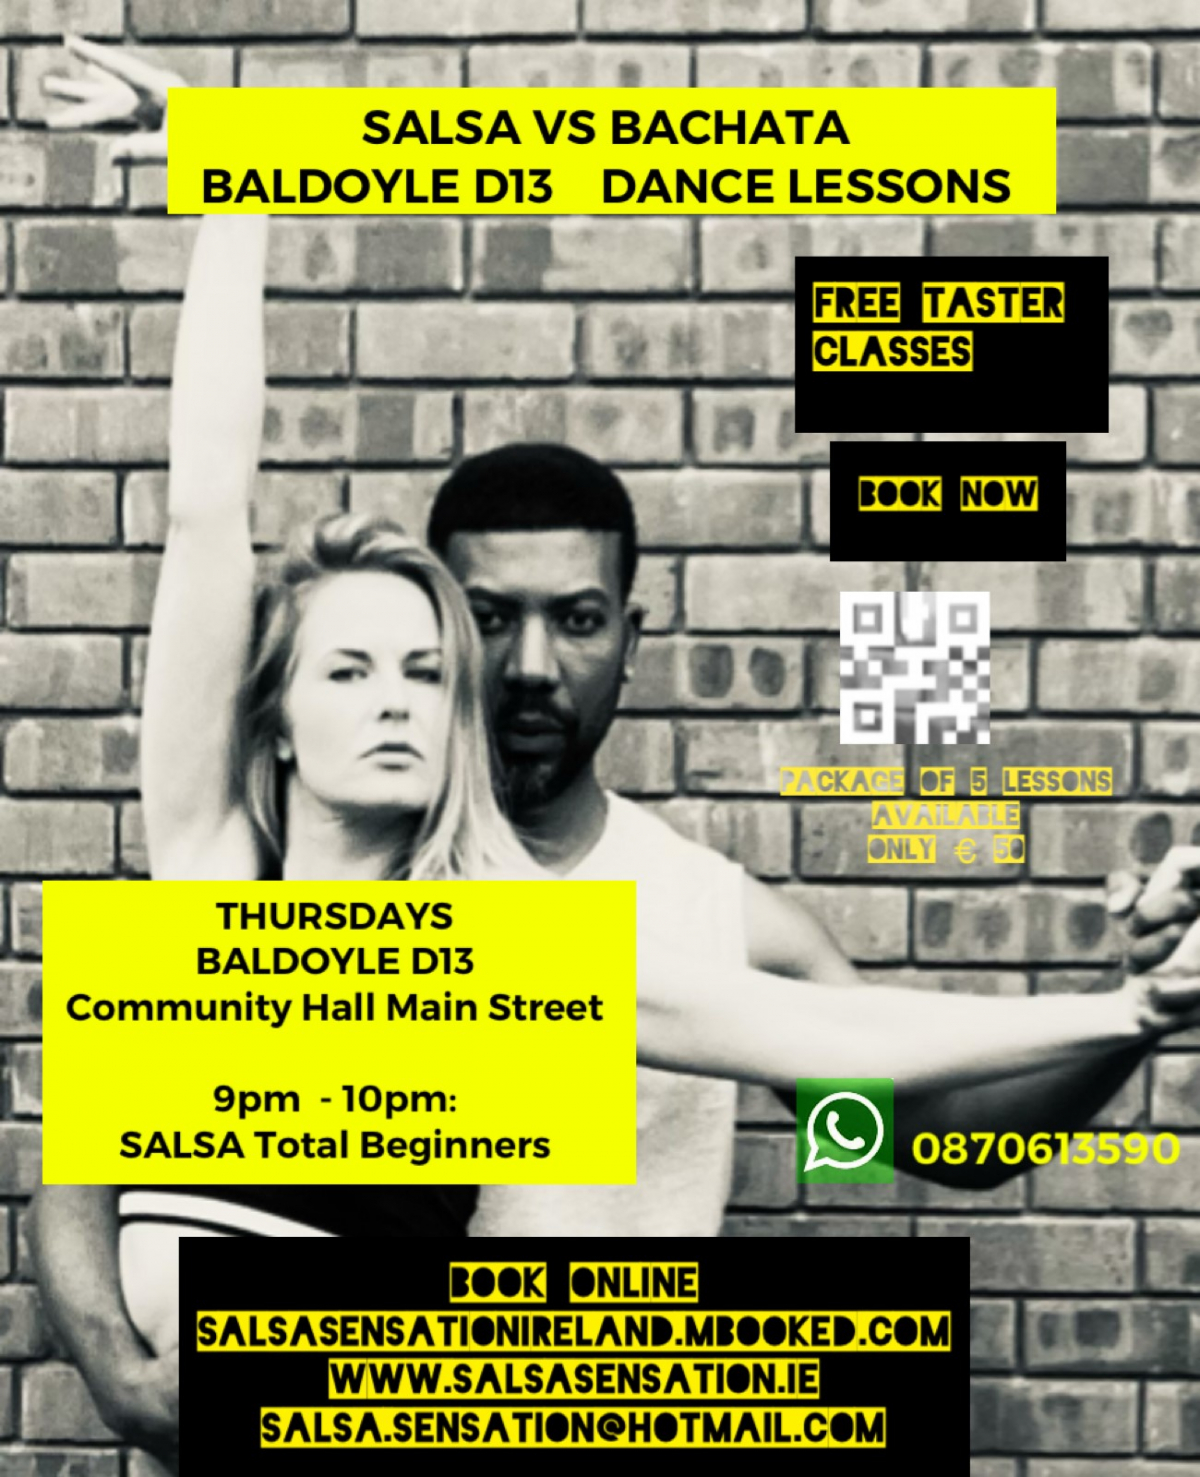 mBooked.com, Thursdays | Salsa Total Beginners | 5 weeks Course | Baldoyle D13, Baldoyle Dublin 13, Salsa Sensation Ireland